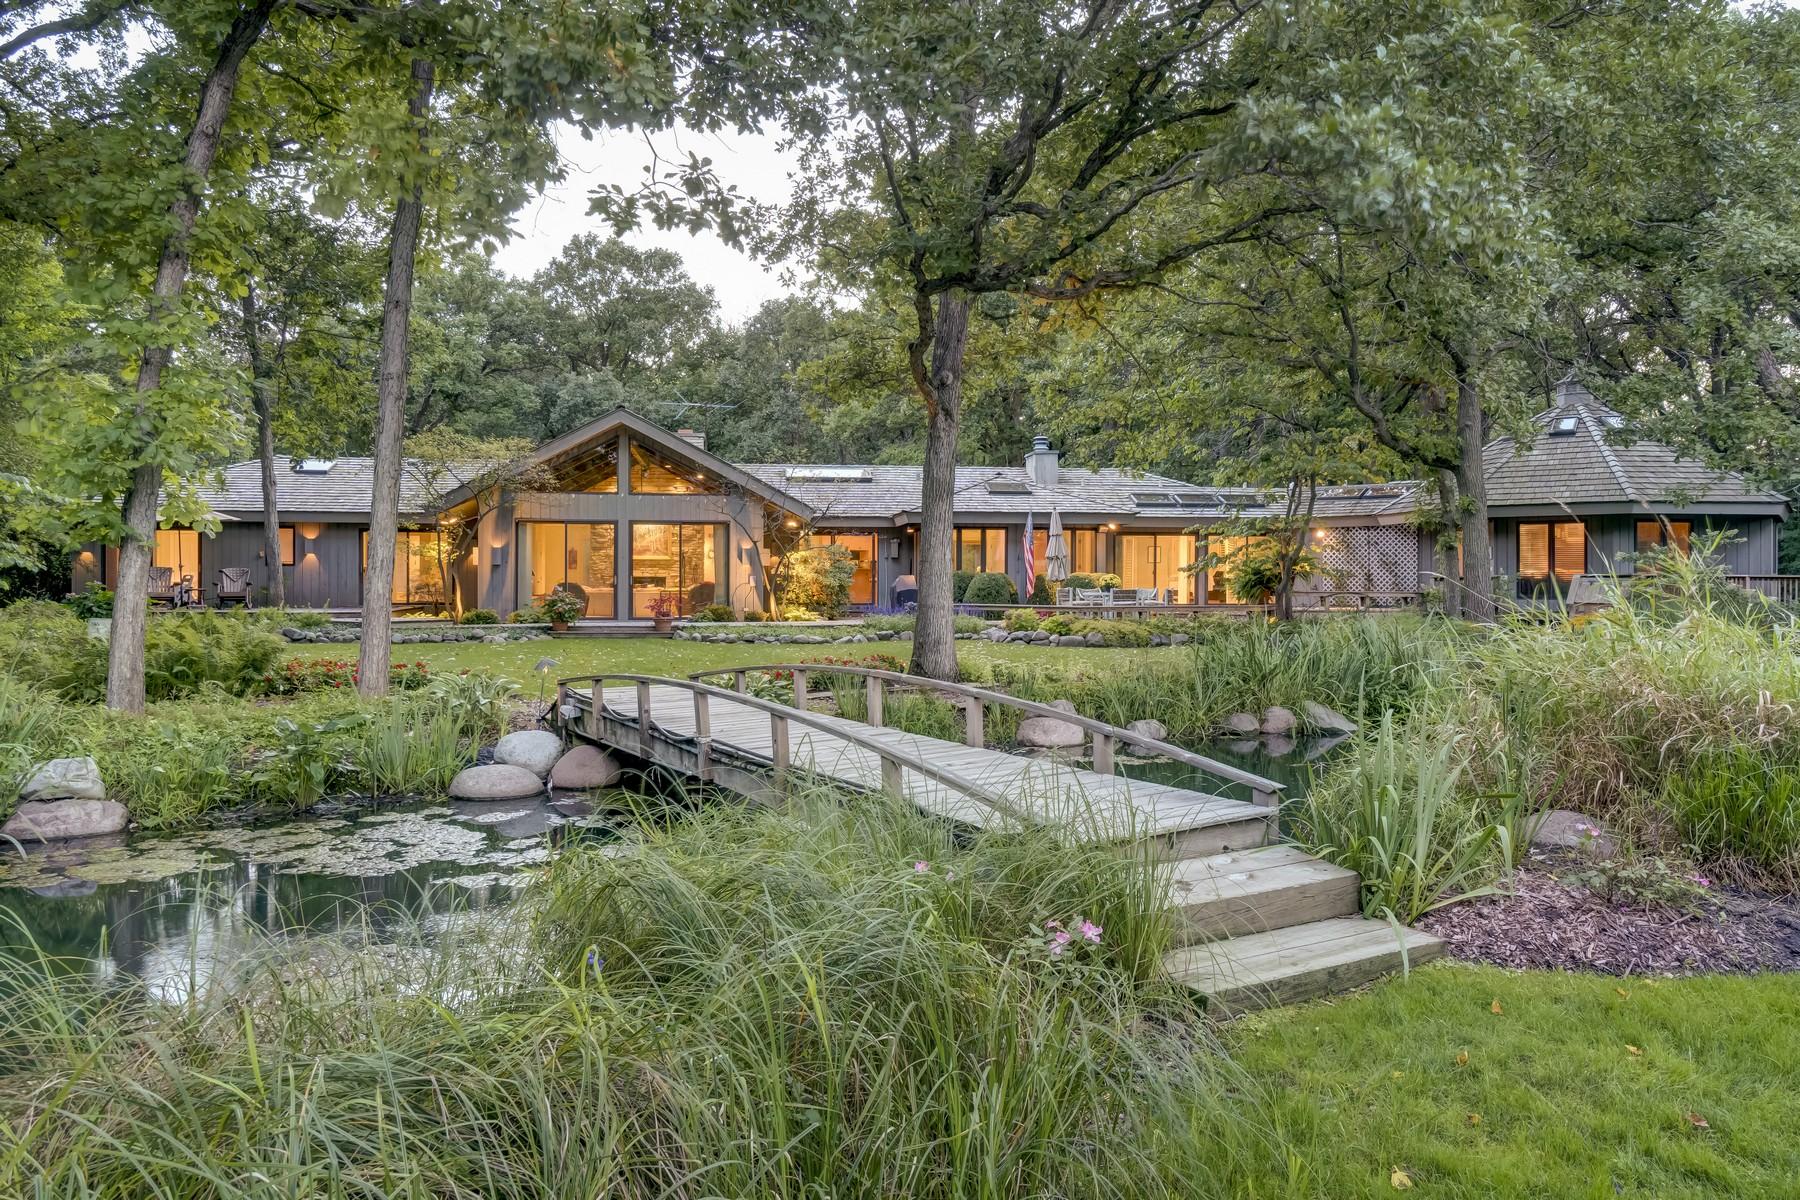 Single Family Home for Sale at Sprawling Ranch 1910 Duffy Lane Bannockburn, Illinois 60015 United States